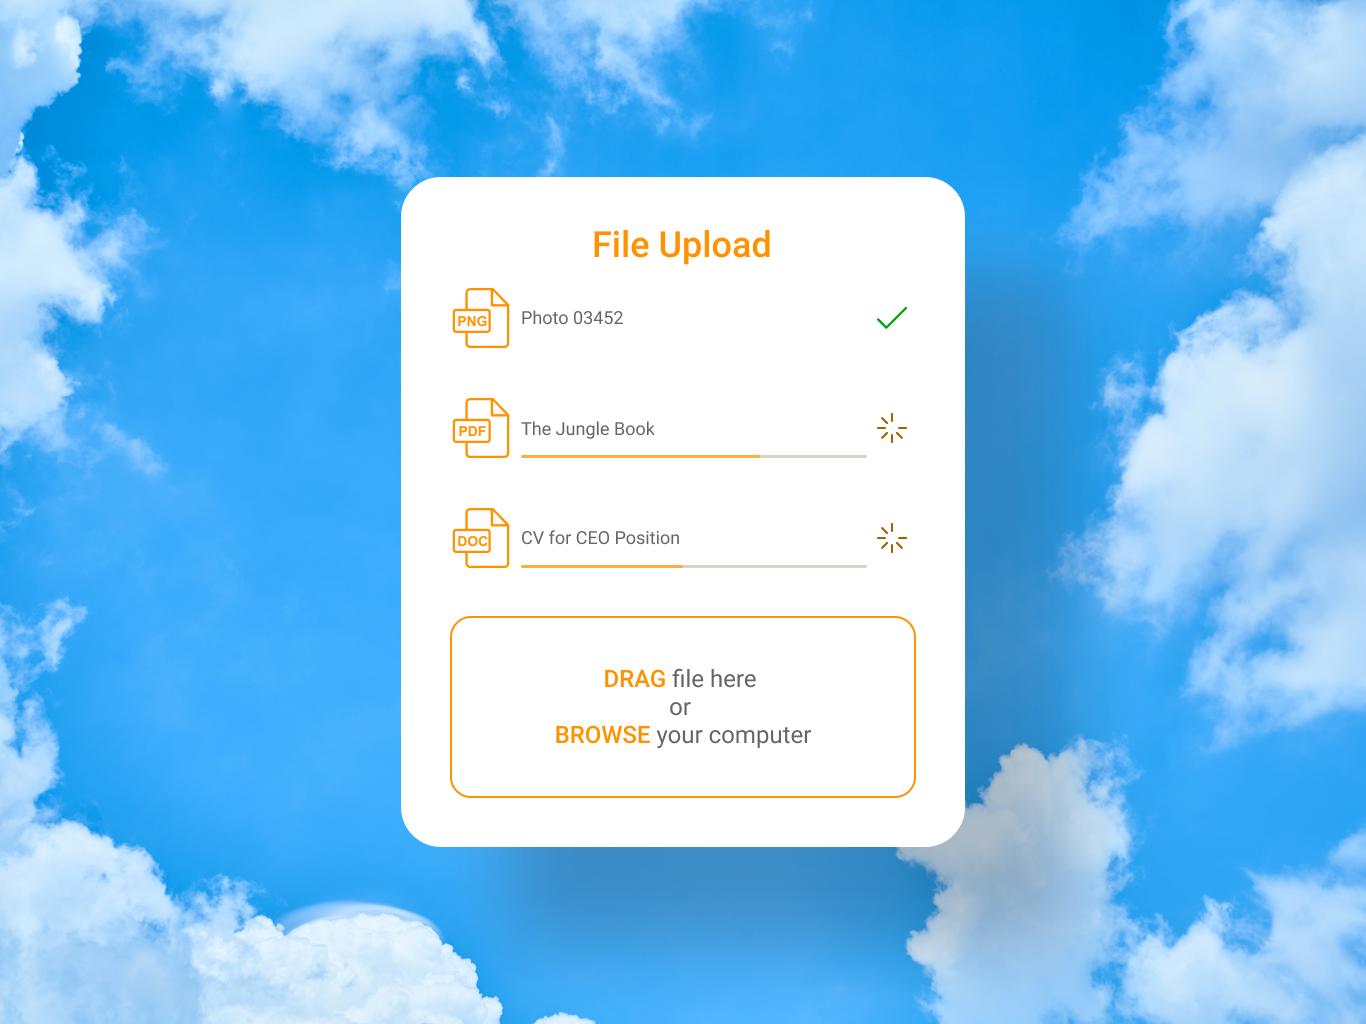 031 file upload uxui uidesign ux design ui dailyui